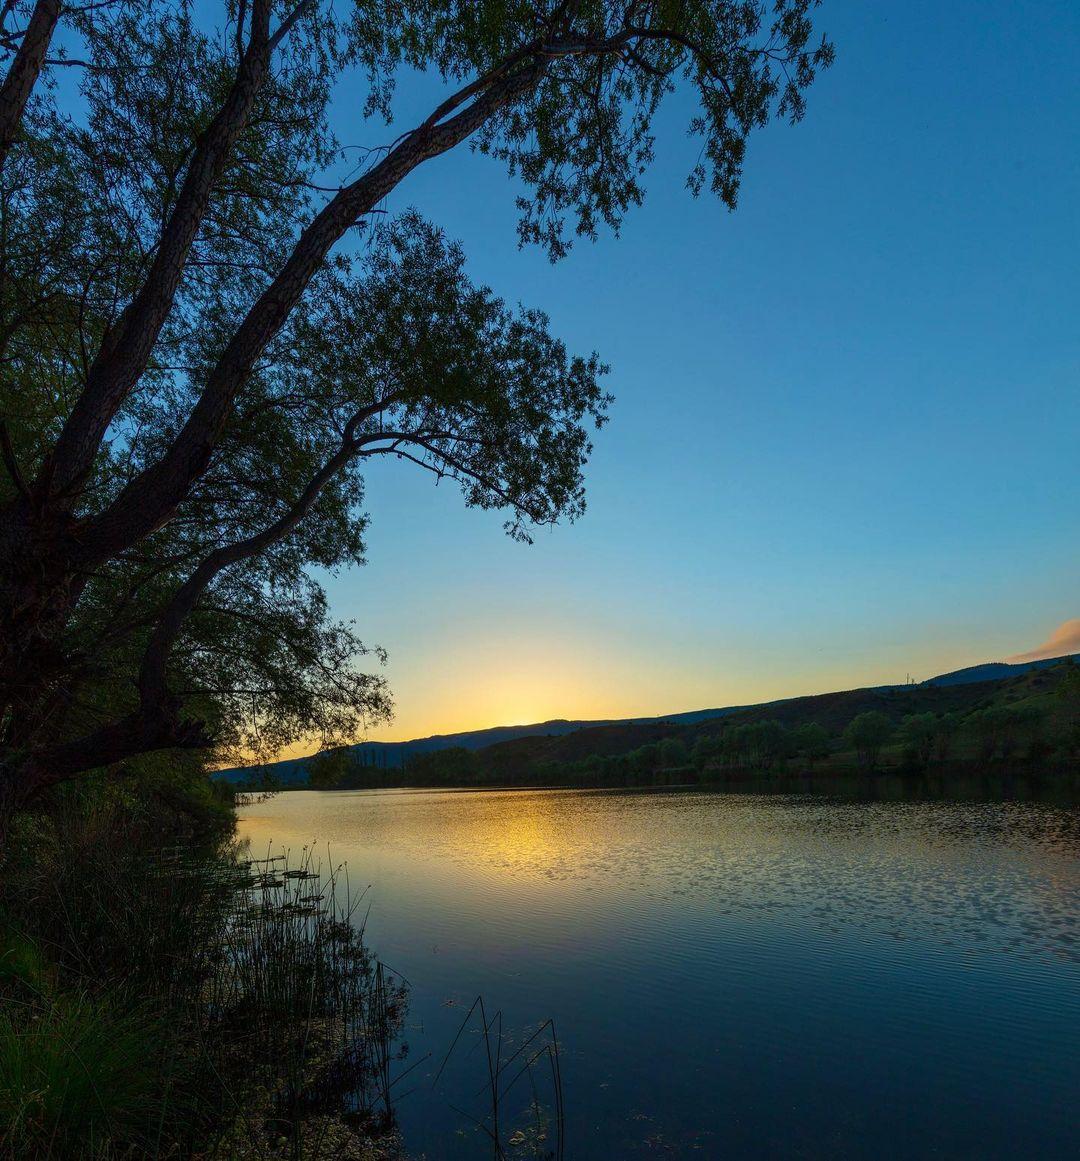 Donwload Photo Kaligrafi Gerede, Kapaklı Köyü, Keçi Gölü...- ozcay 1